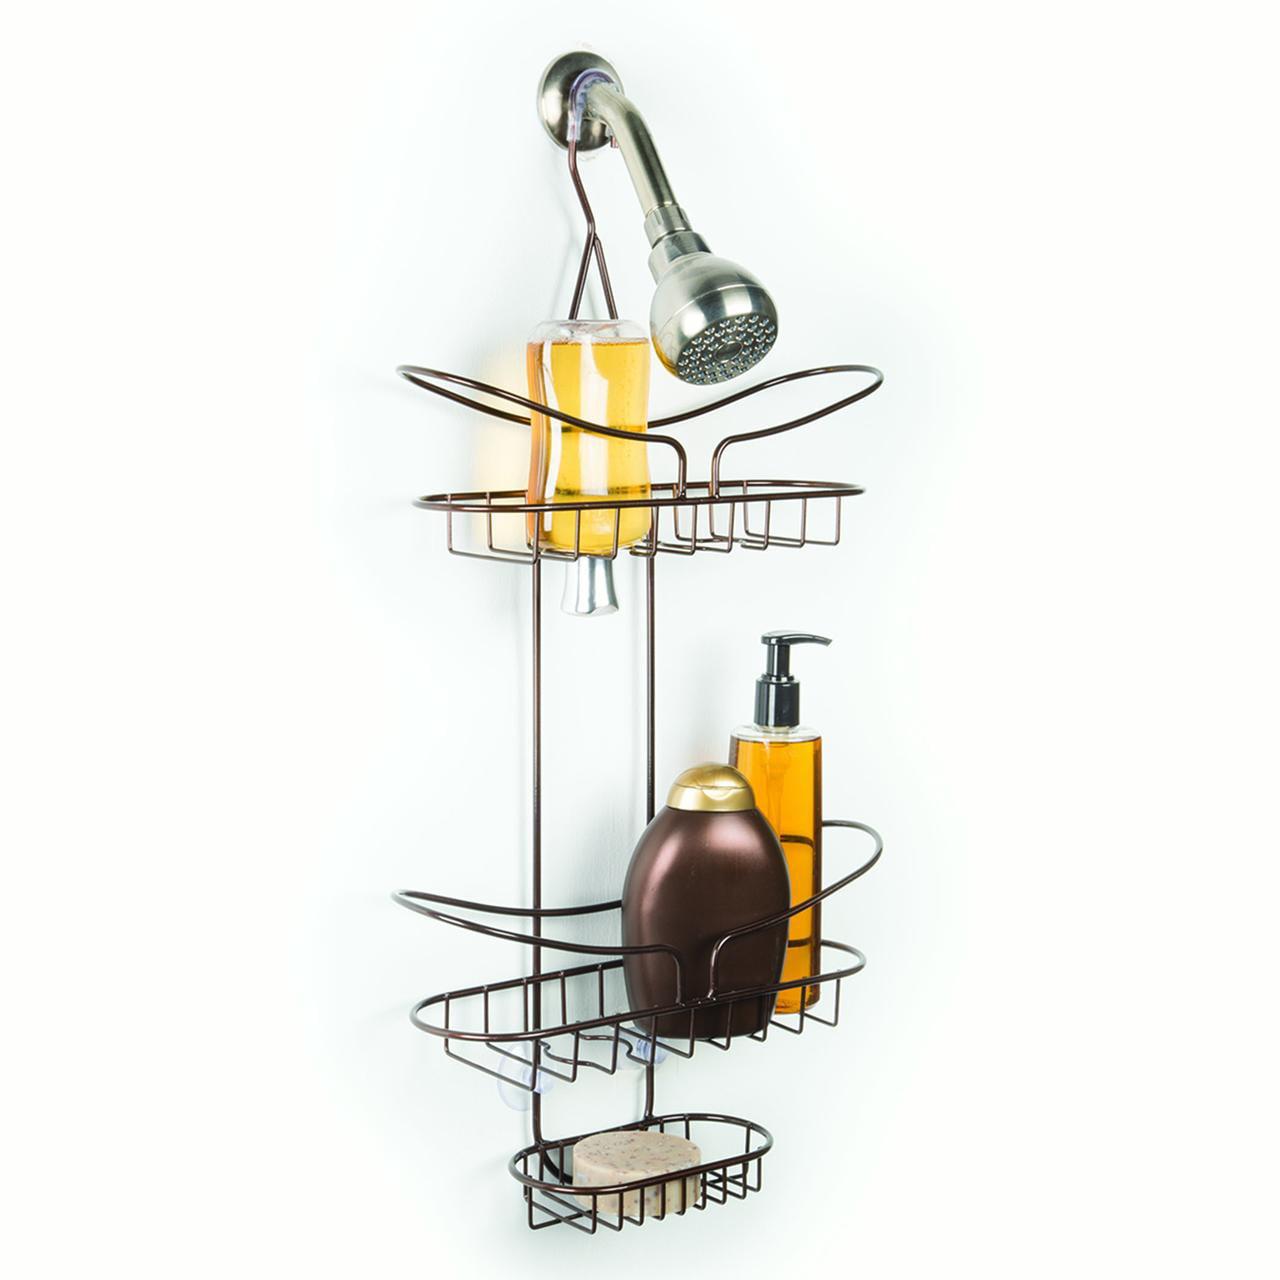 Richards Homewares Flip & Store Hamilton Bronze Shower Caddy Wire Construction by Richards Homewares